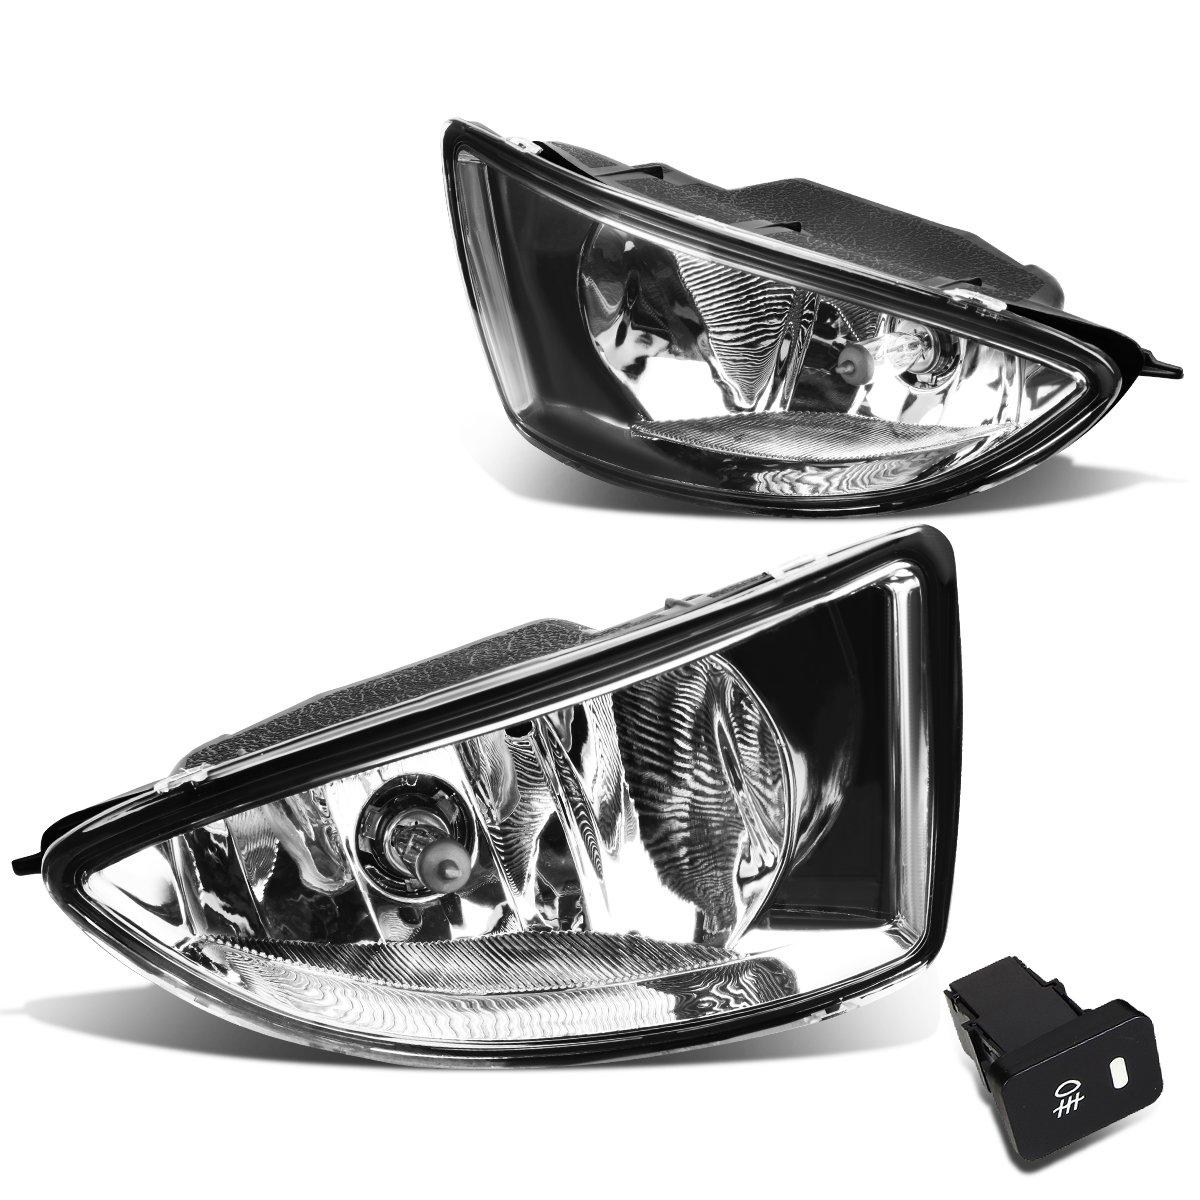 Driving Light Wiring Diagram Further Honda Civic Main Relay Location